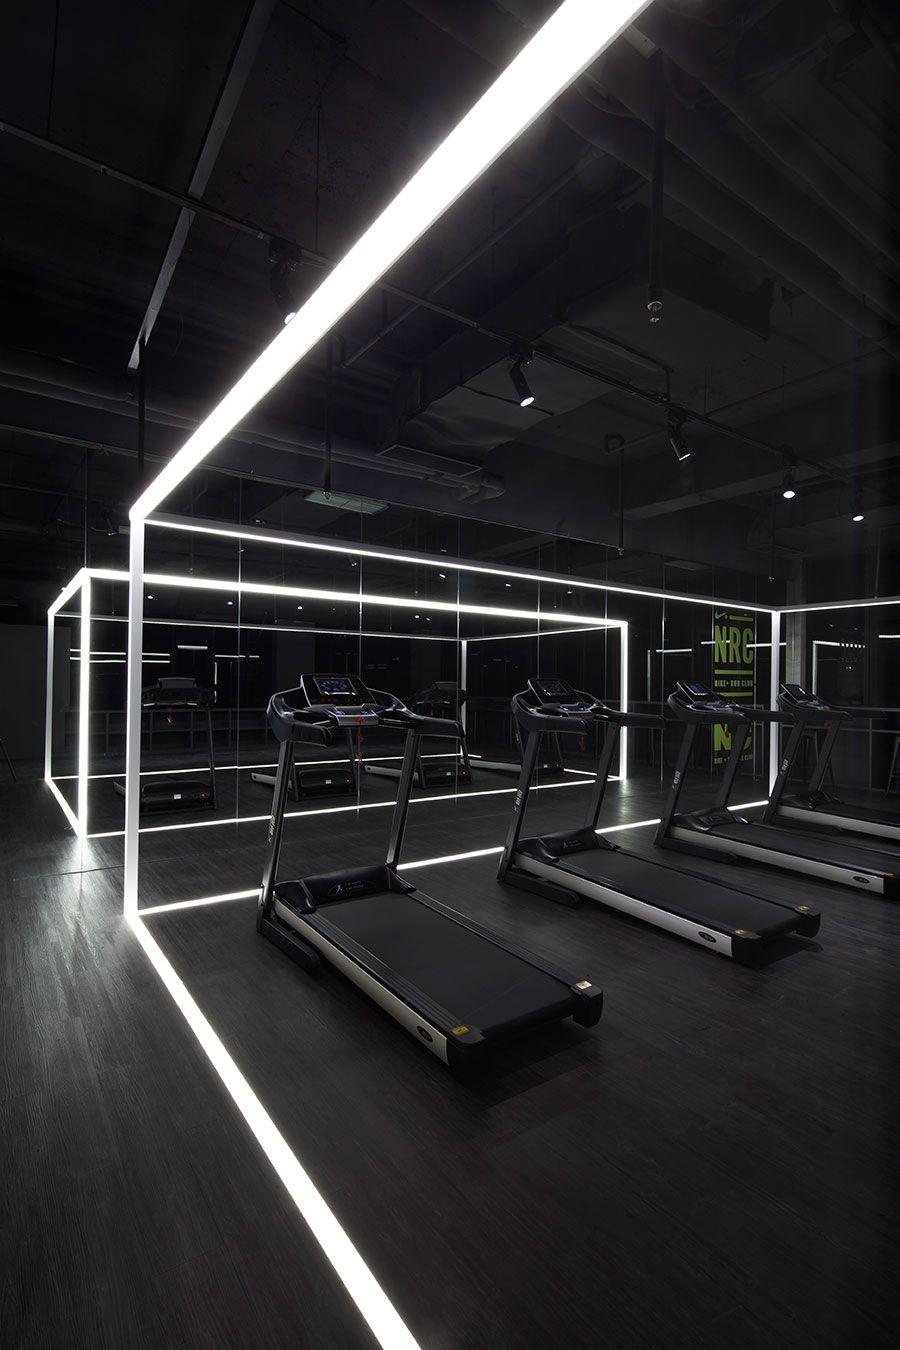 The nike studio coordination asia interior design for Salon fitness